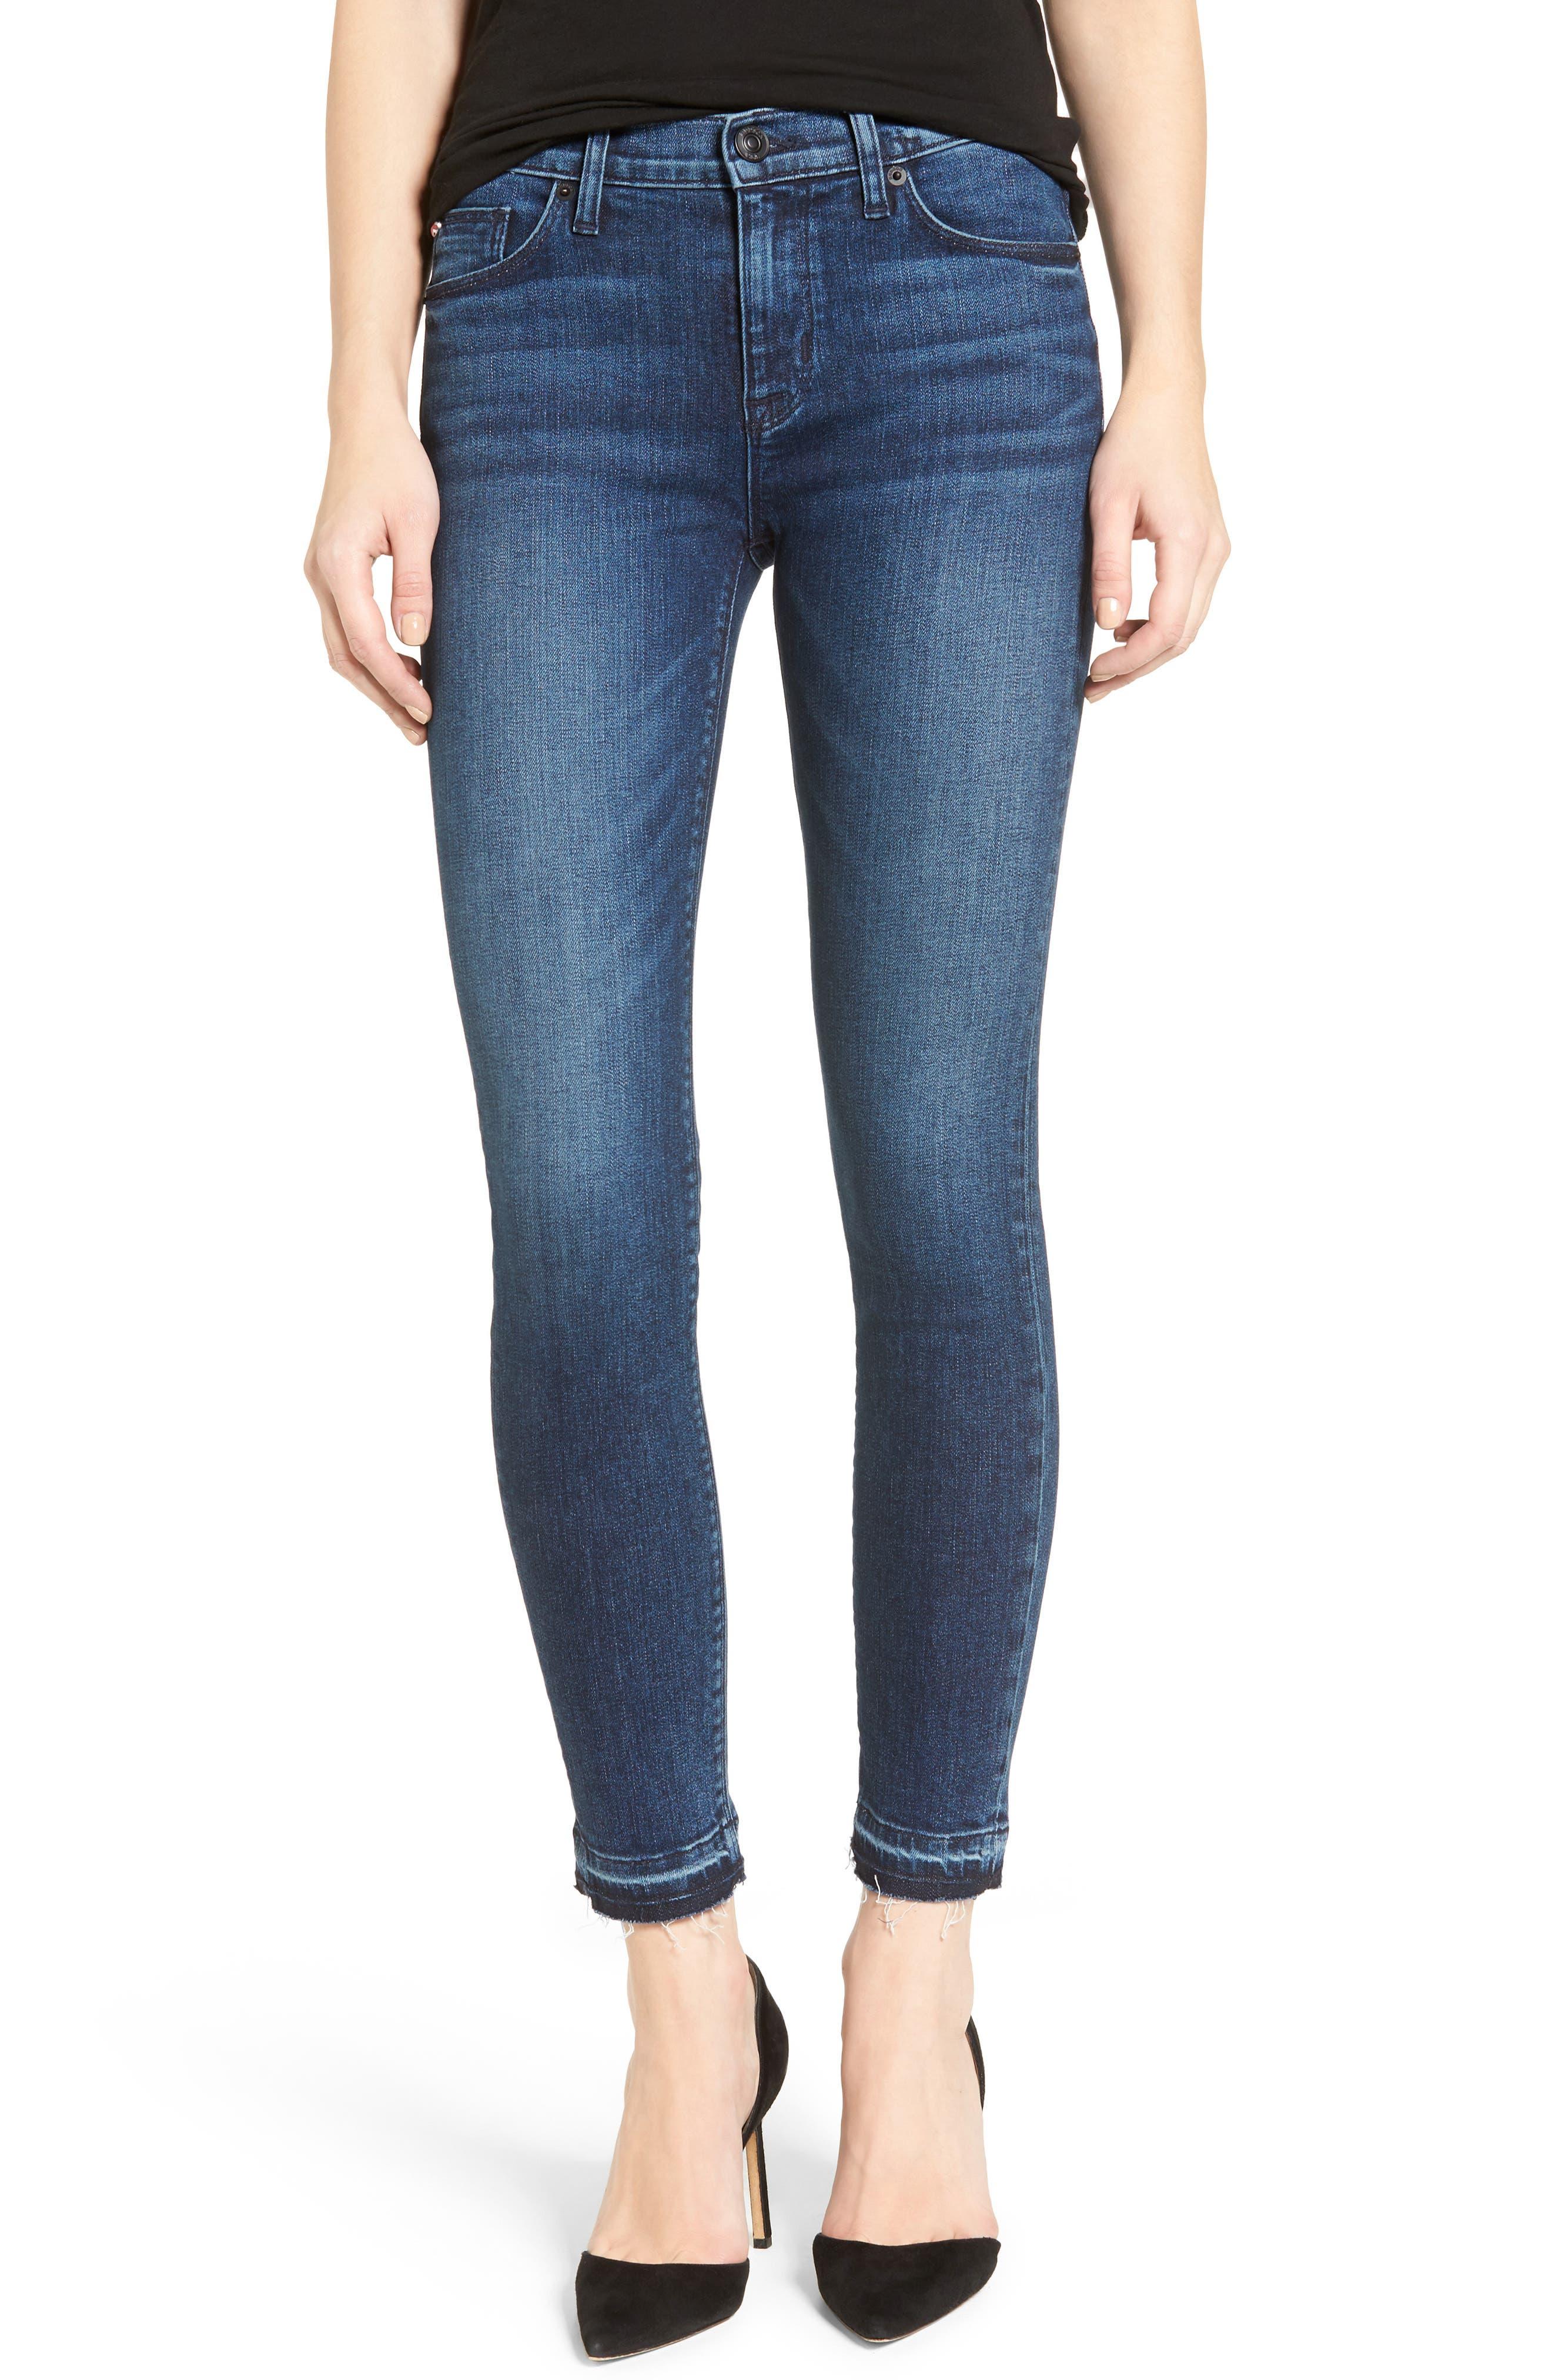 Alternate Image 1 Selected - Hudson Jeans Nico Released Hem Ankle Skinny Jeans